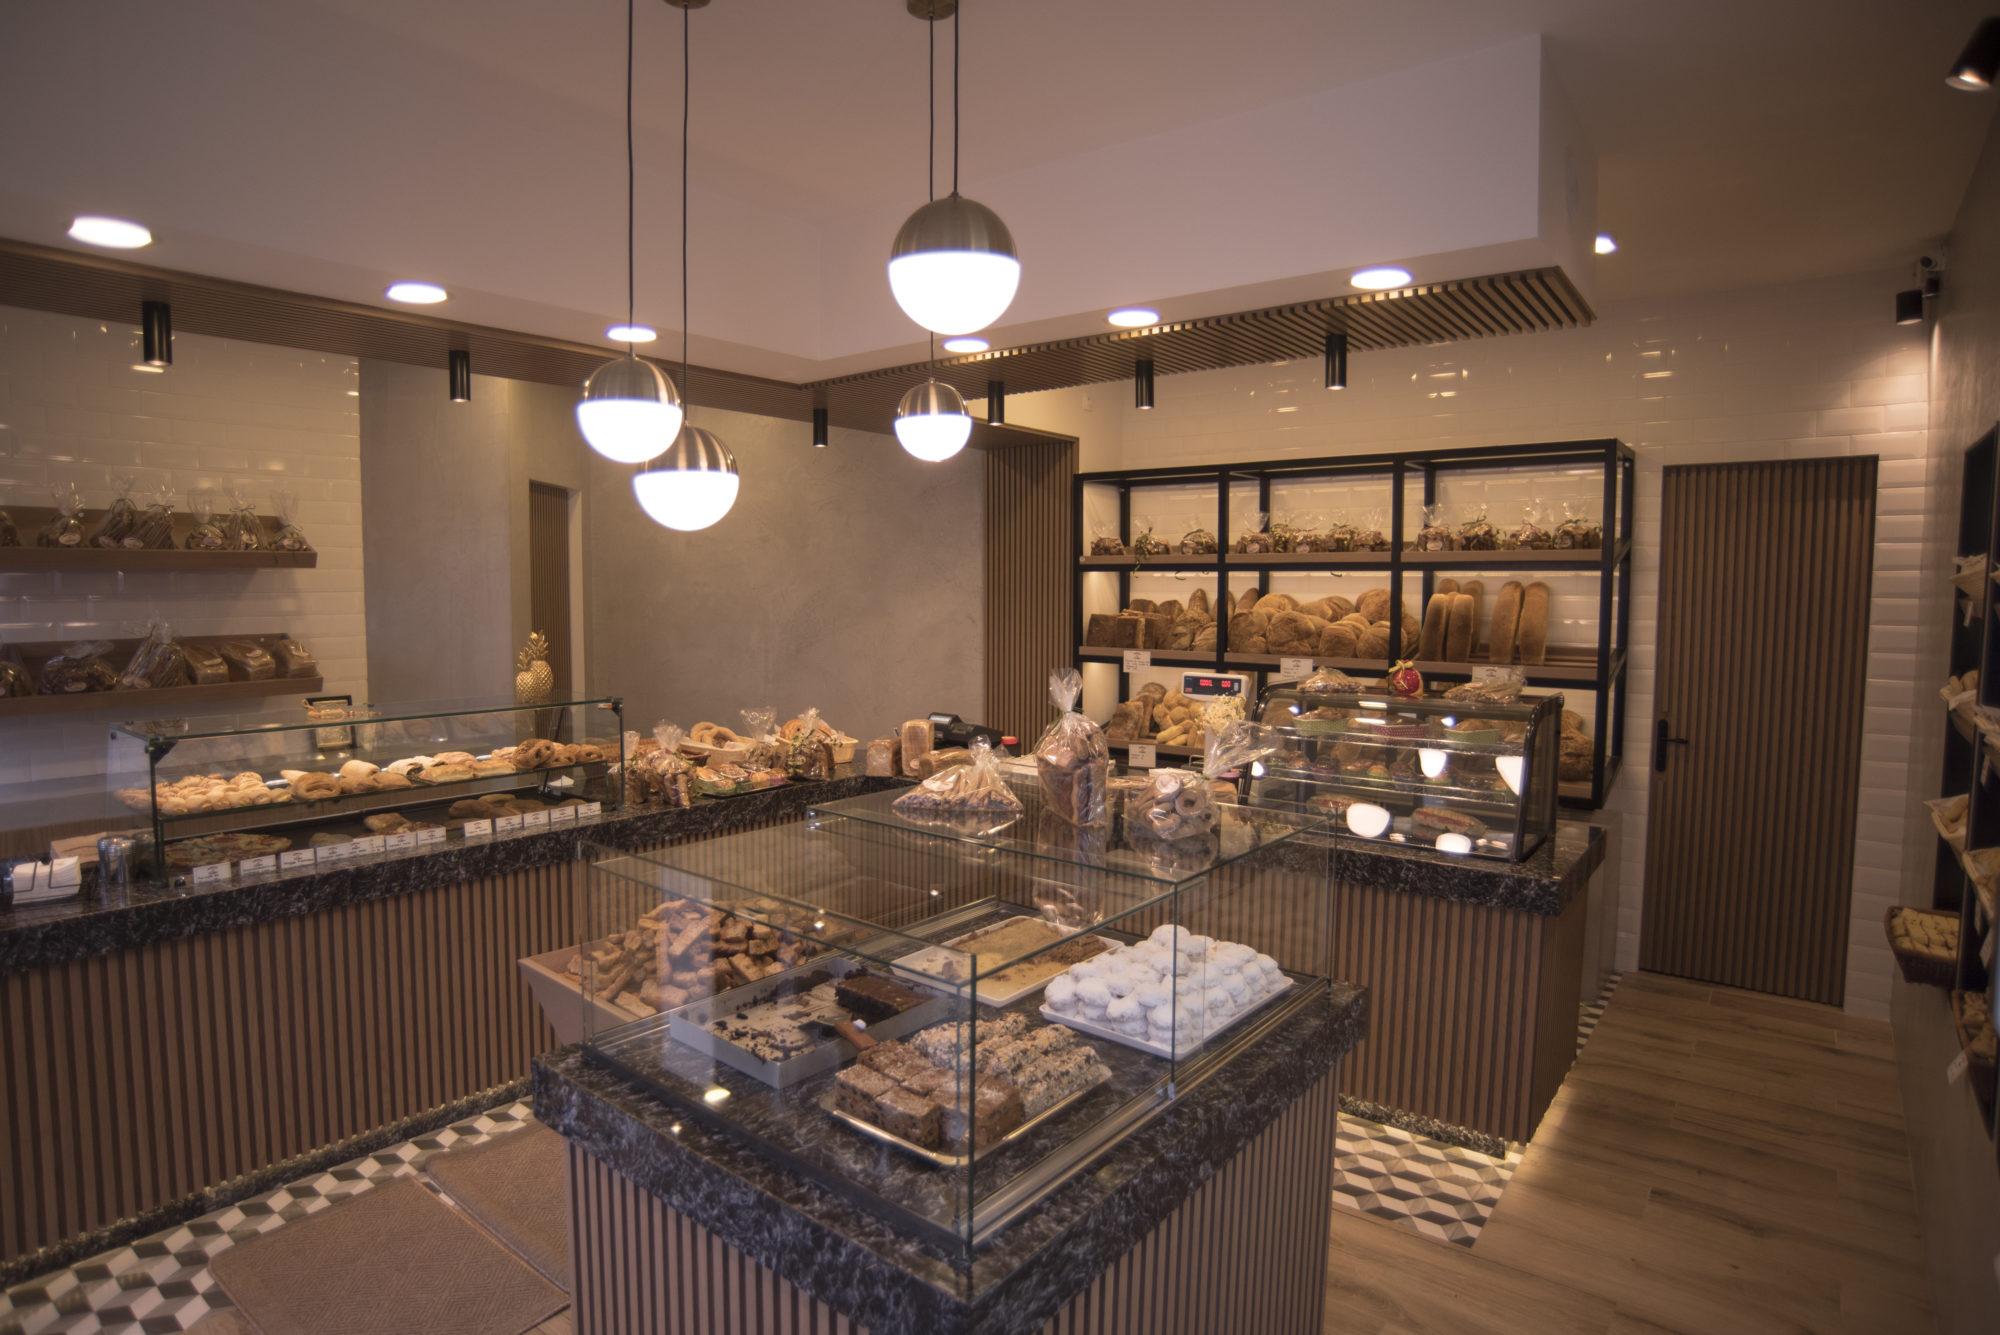 Balaskas Bakery